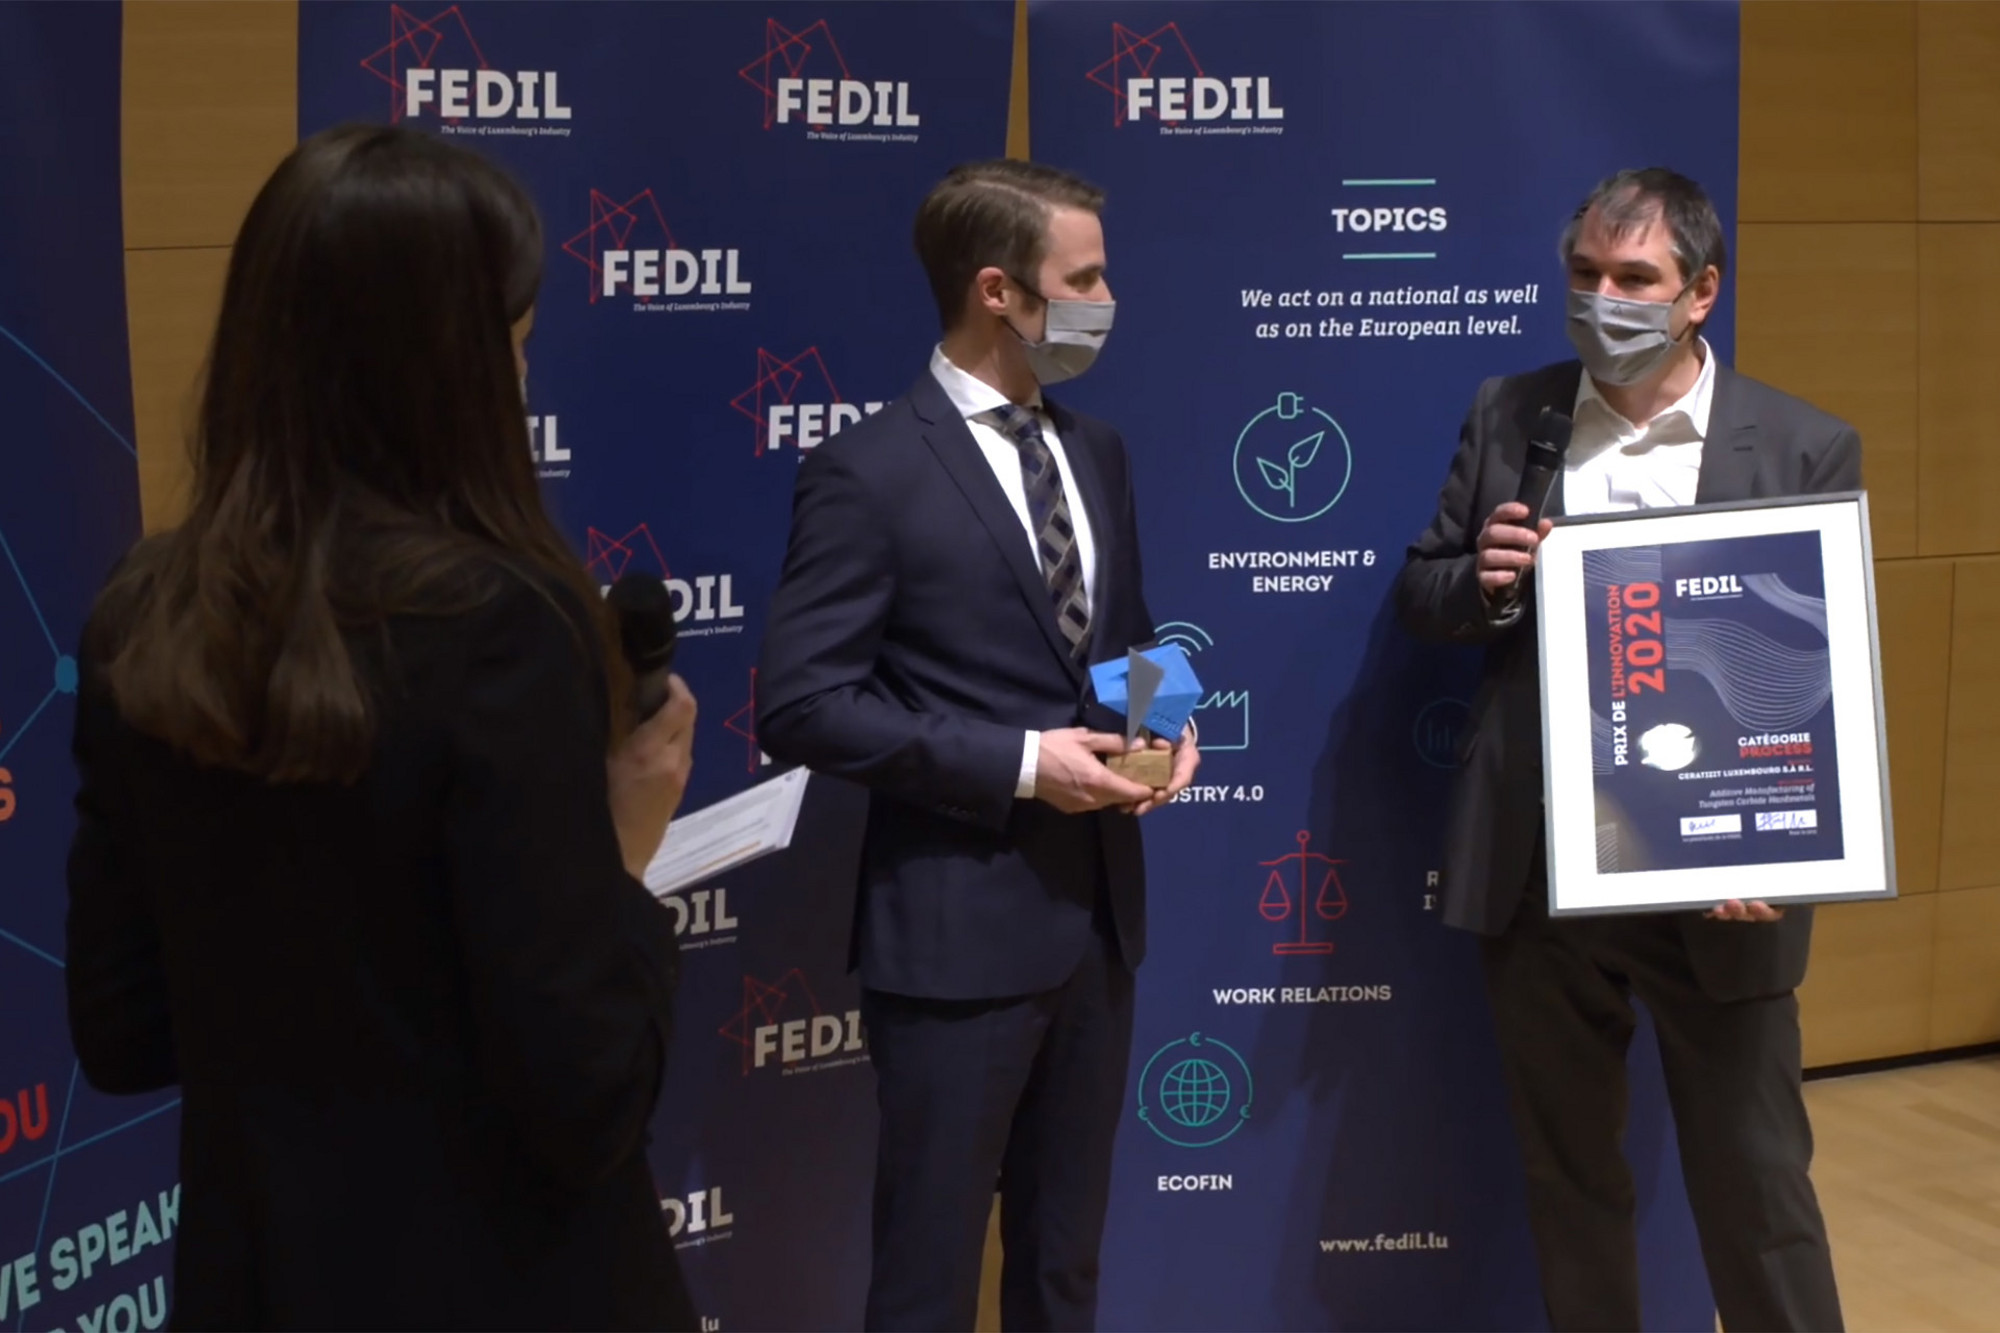 Innovation Award of the FEDIL business federation